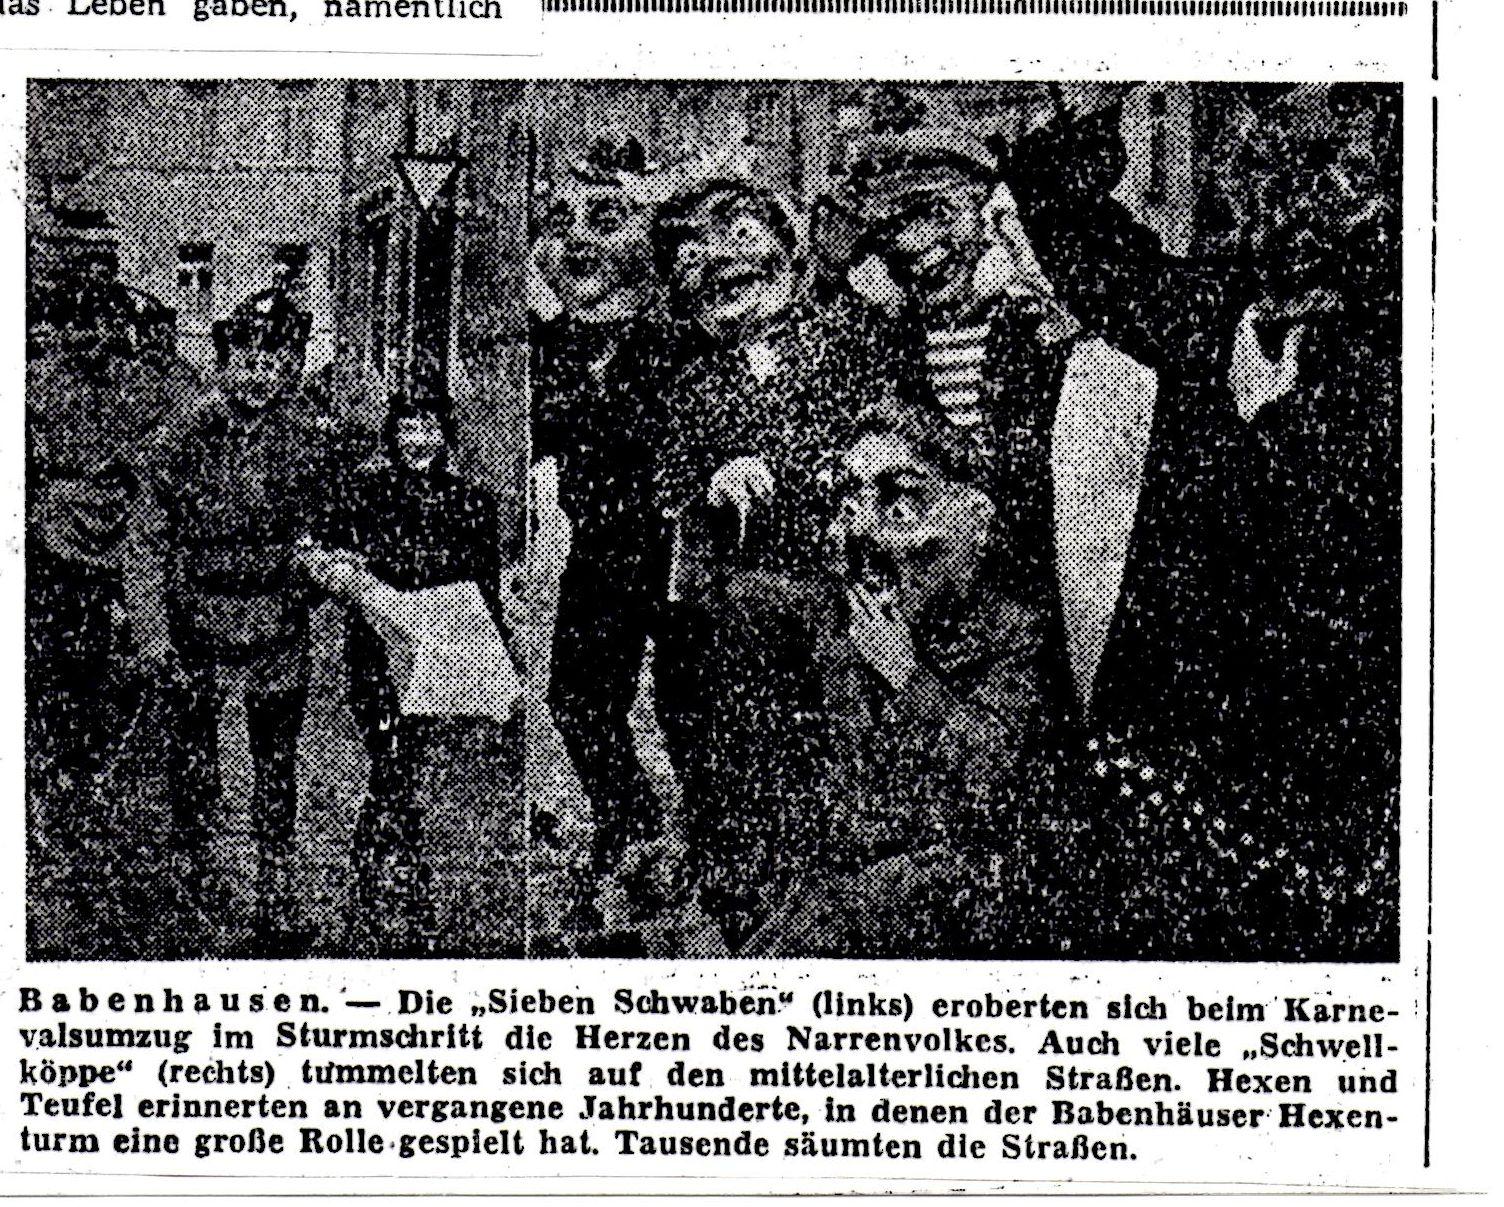 http://hessische-ludwigsbahn.de/196392.jpg